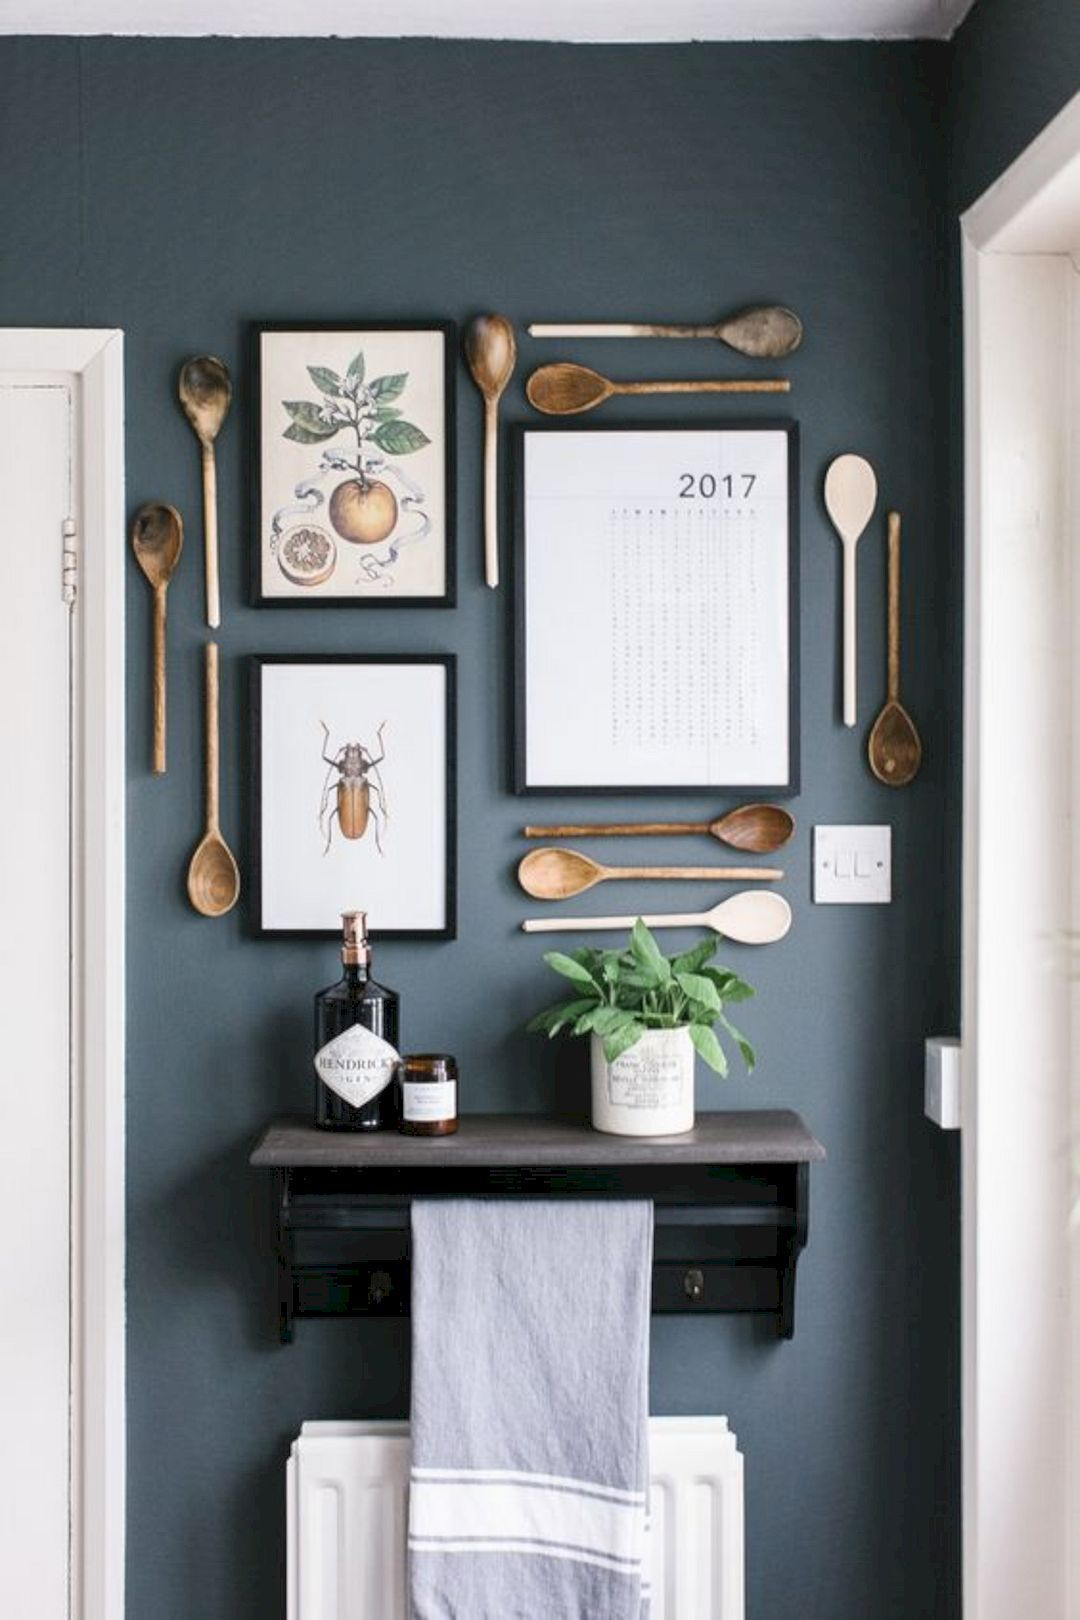 16 Gorgeous Kitchen Wall Decorations  Home decor kitchen, Decor